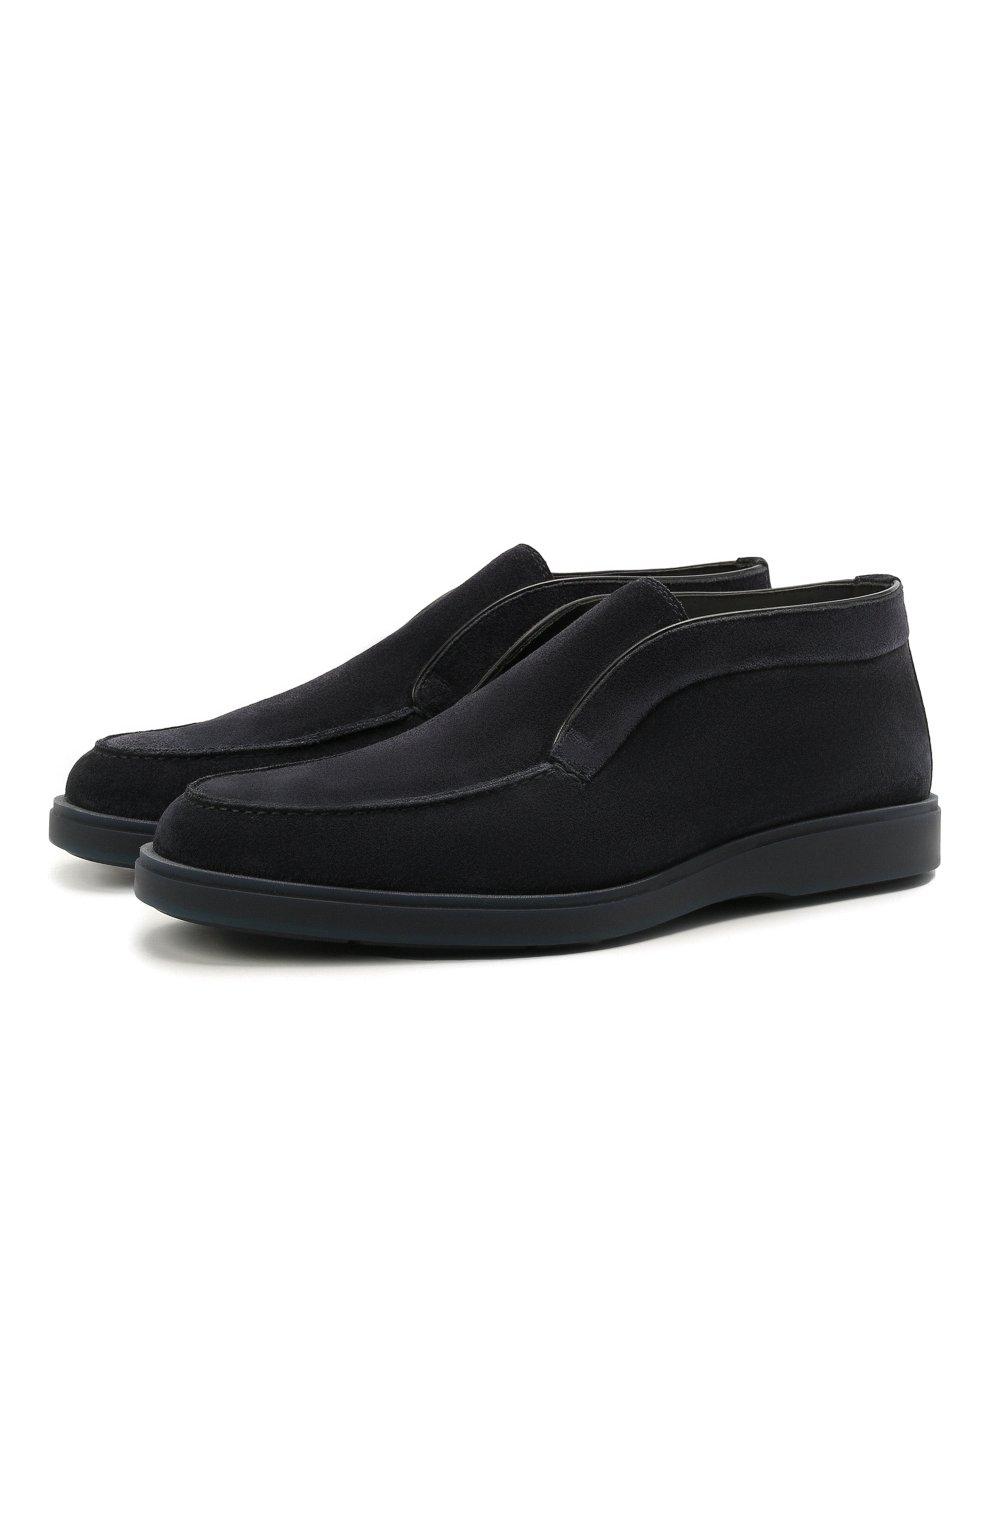 Мужские замшевые ботинки SANTONI темно-синего цвета, арт. MGDT1782300TASVUU60   Фото 1 (Мужское Кросс-КТ: Ботинки-обувь, зимние ботинки; Подошва: Плоская)